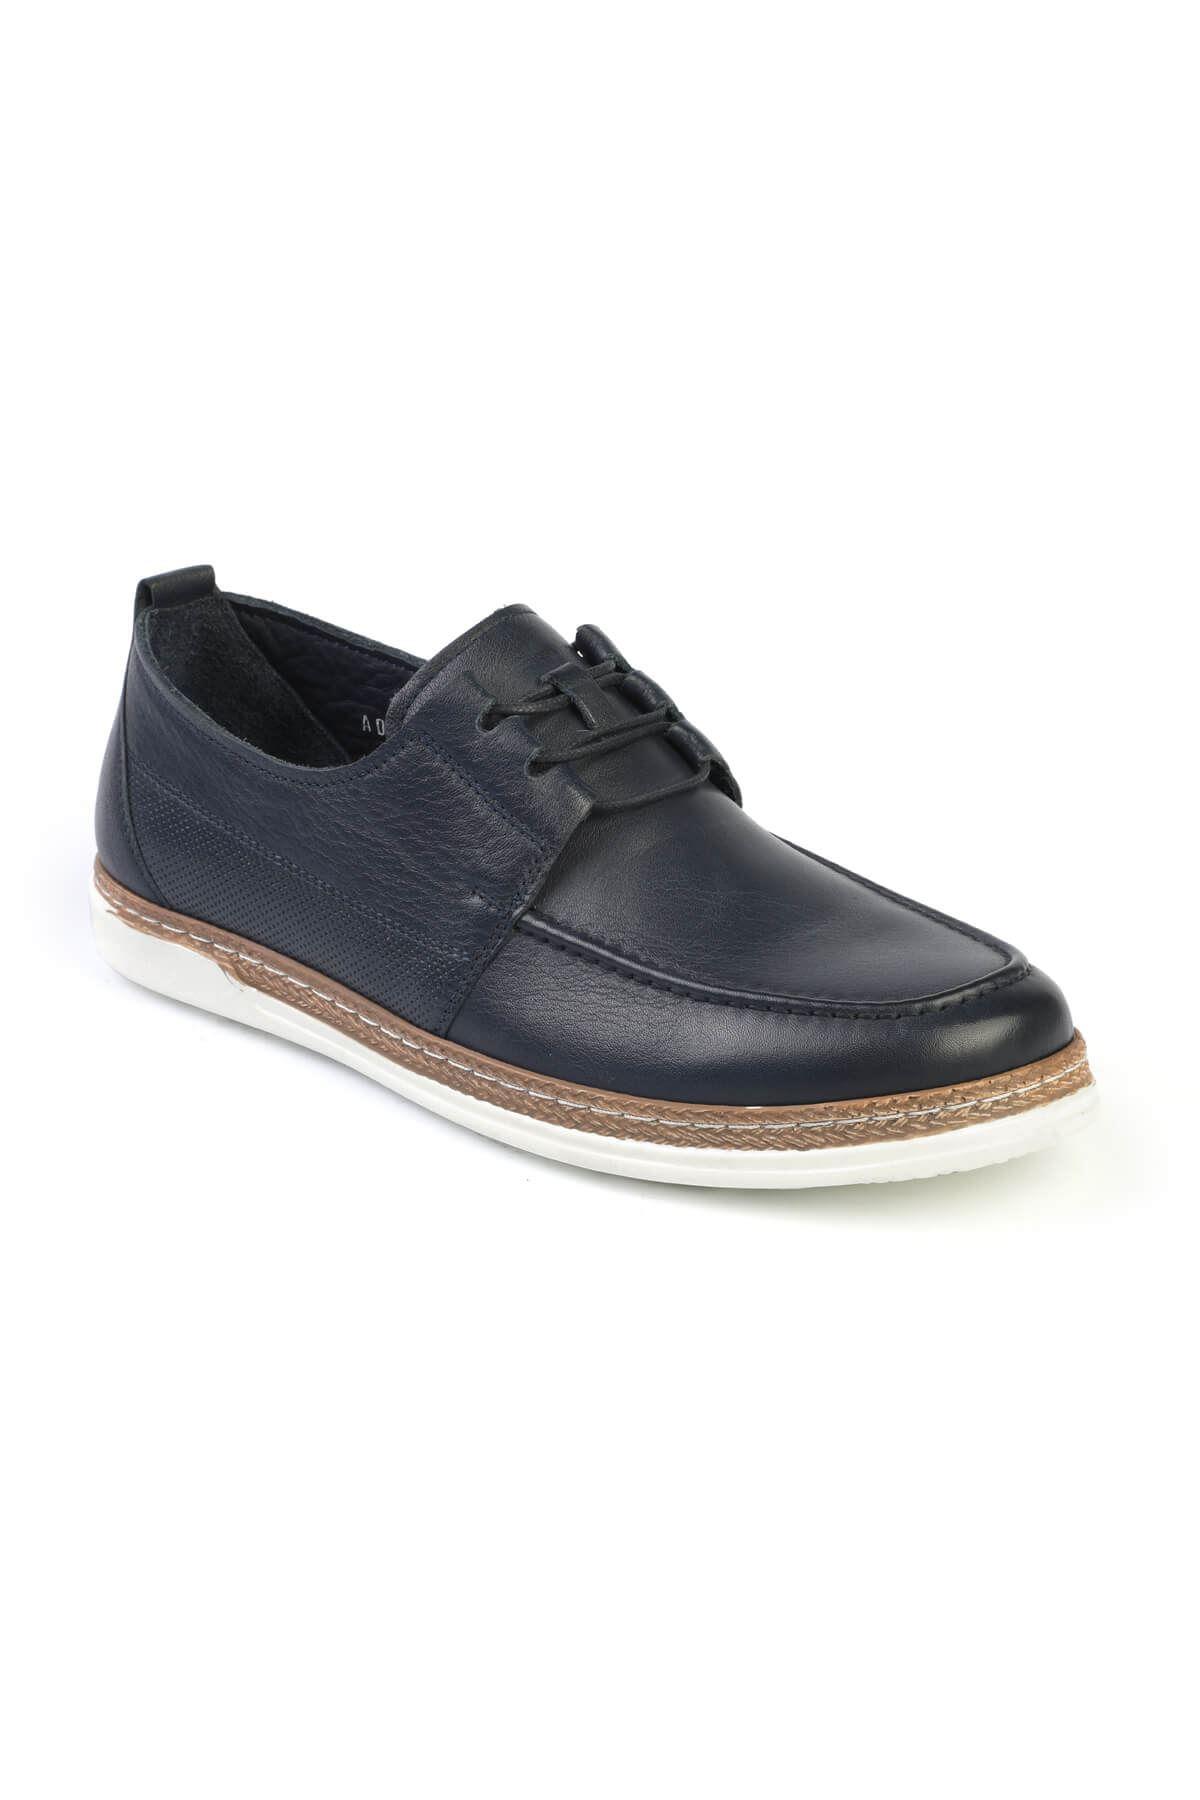 Libero C626 Navy Blue Casual Shoes